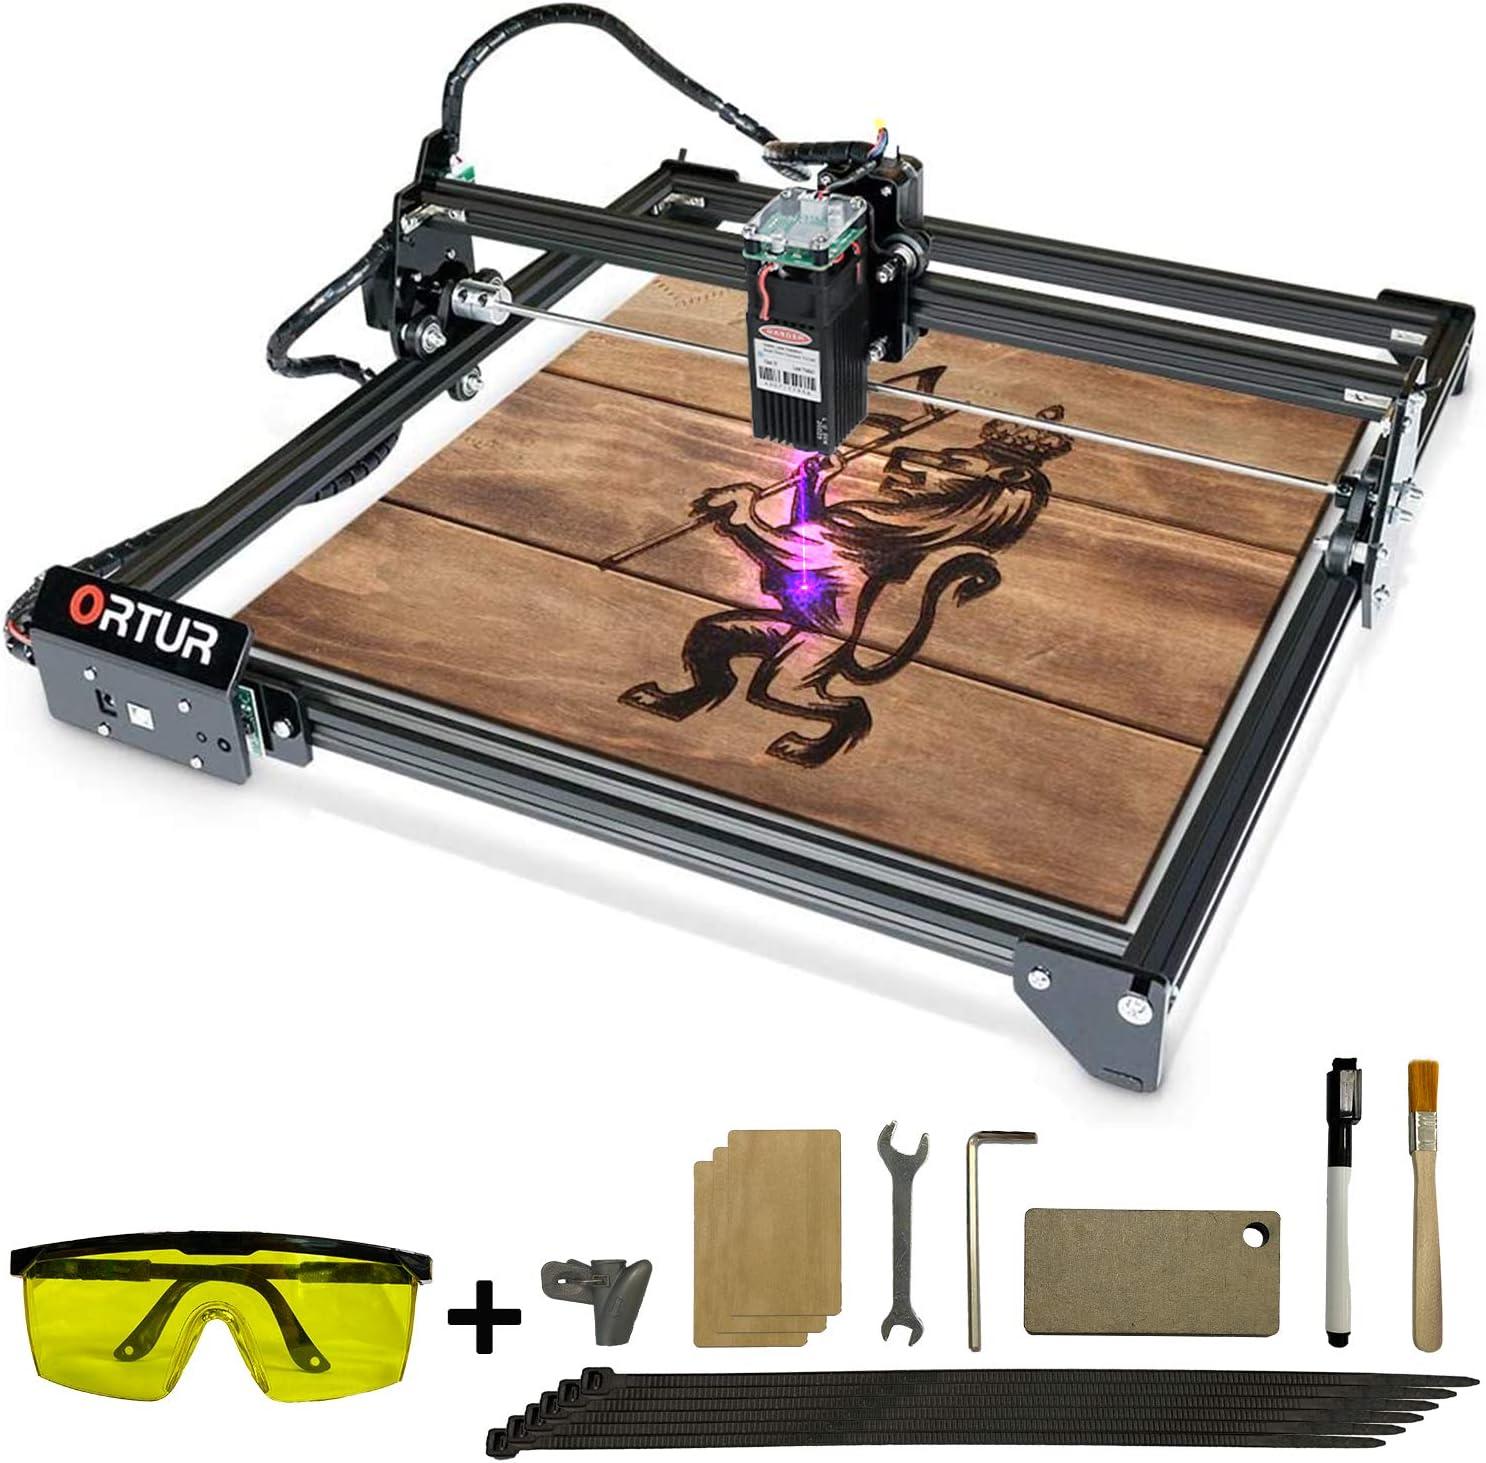 ORTUR Laser Master 2 CNC